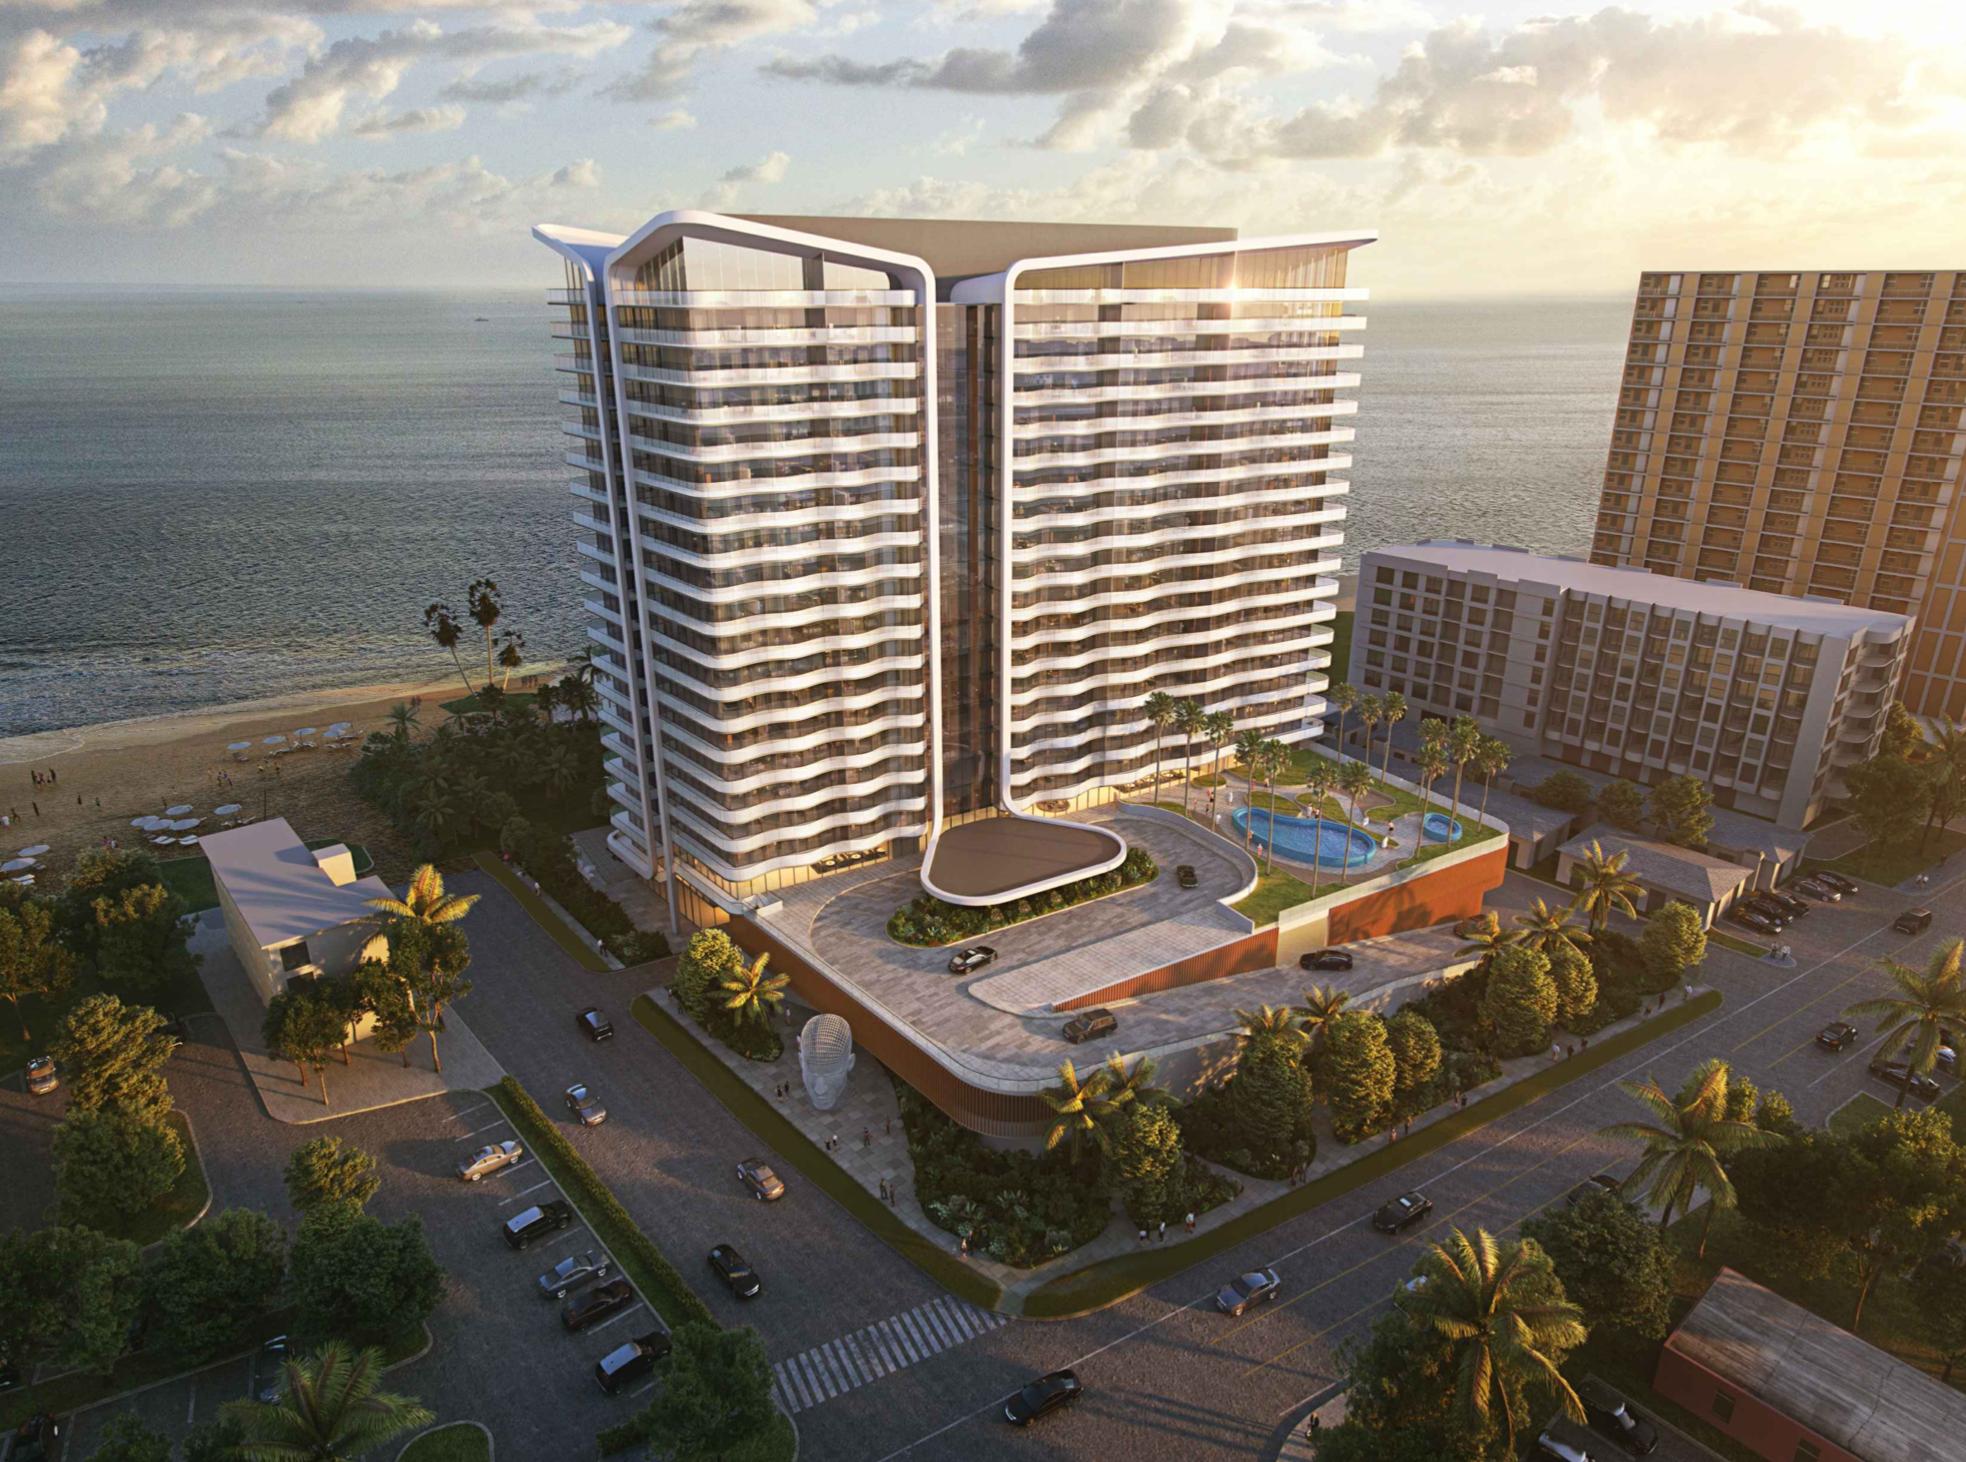 900 N Ocean Blvd. Designed by Arquitectonica.